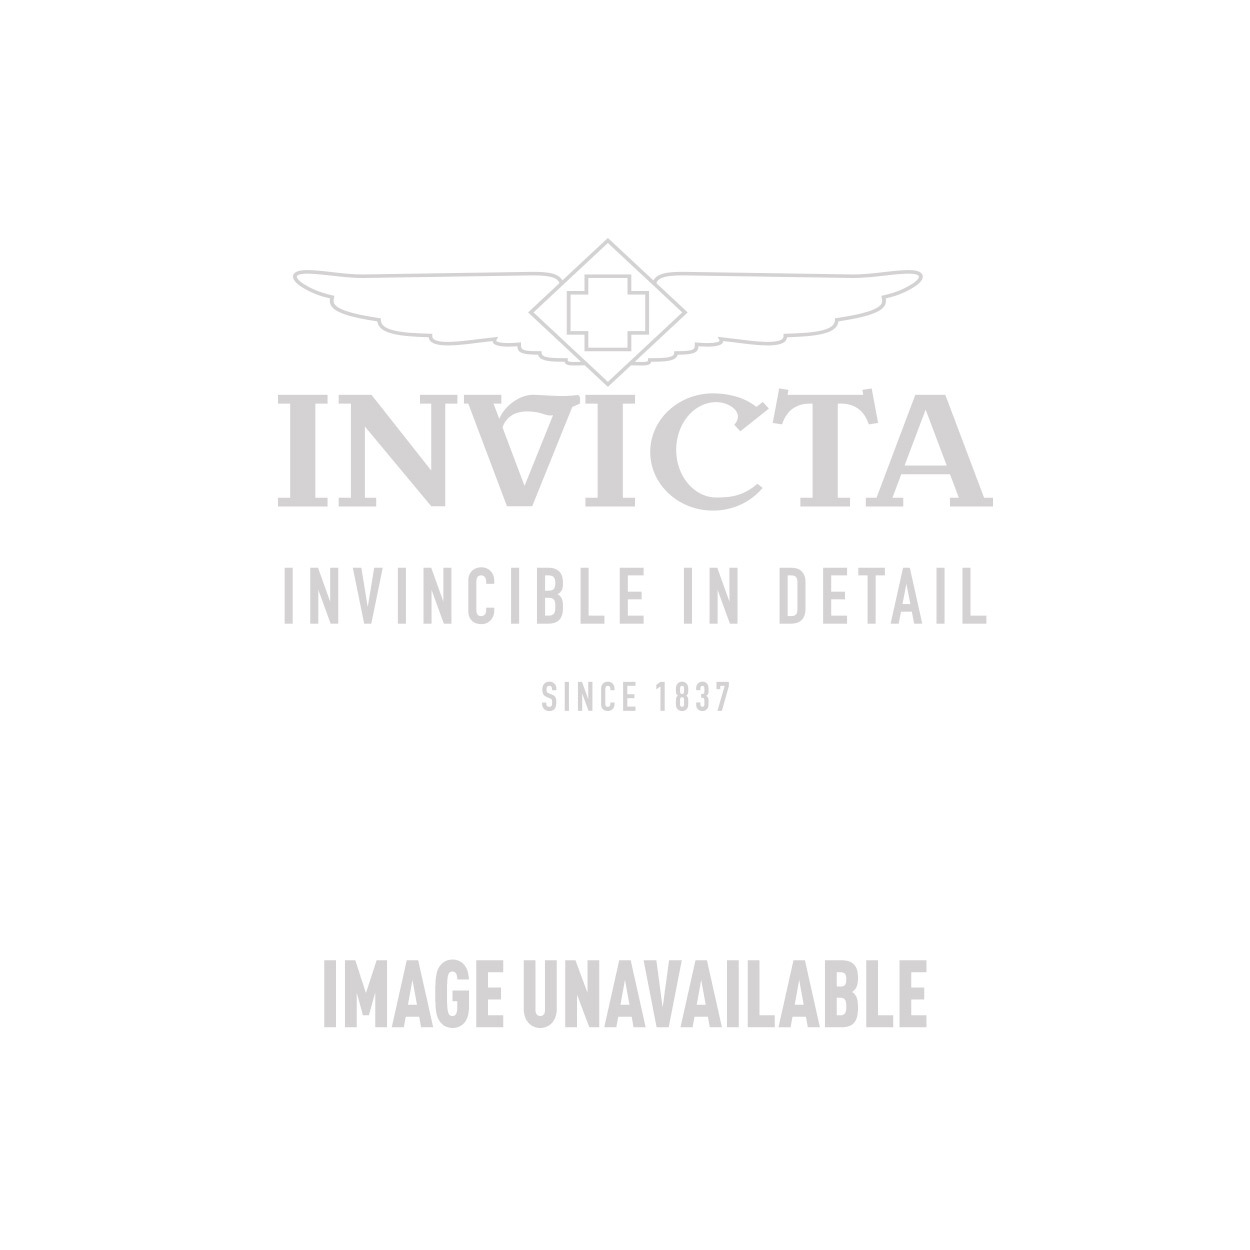 Invicta S1 Rally  Quartz Watch - Gold case with Black tone Polyurethane band - Model 6493